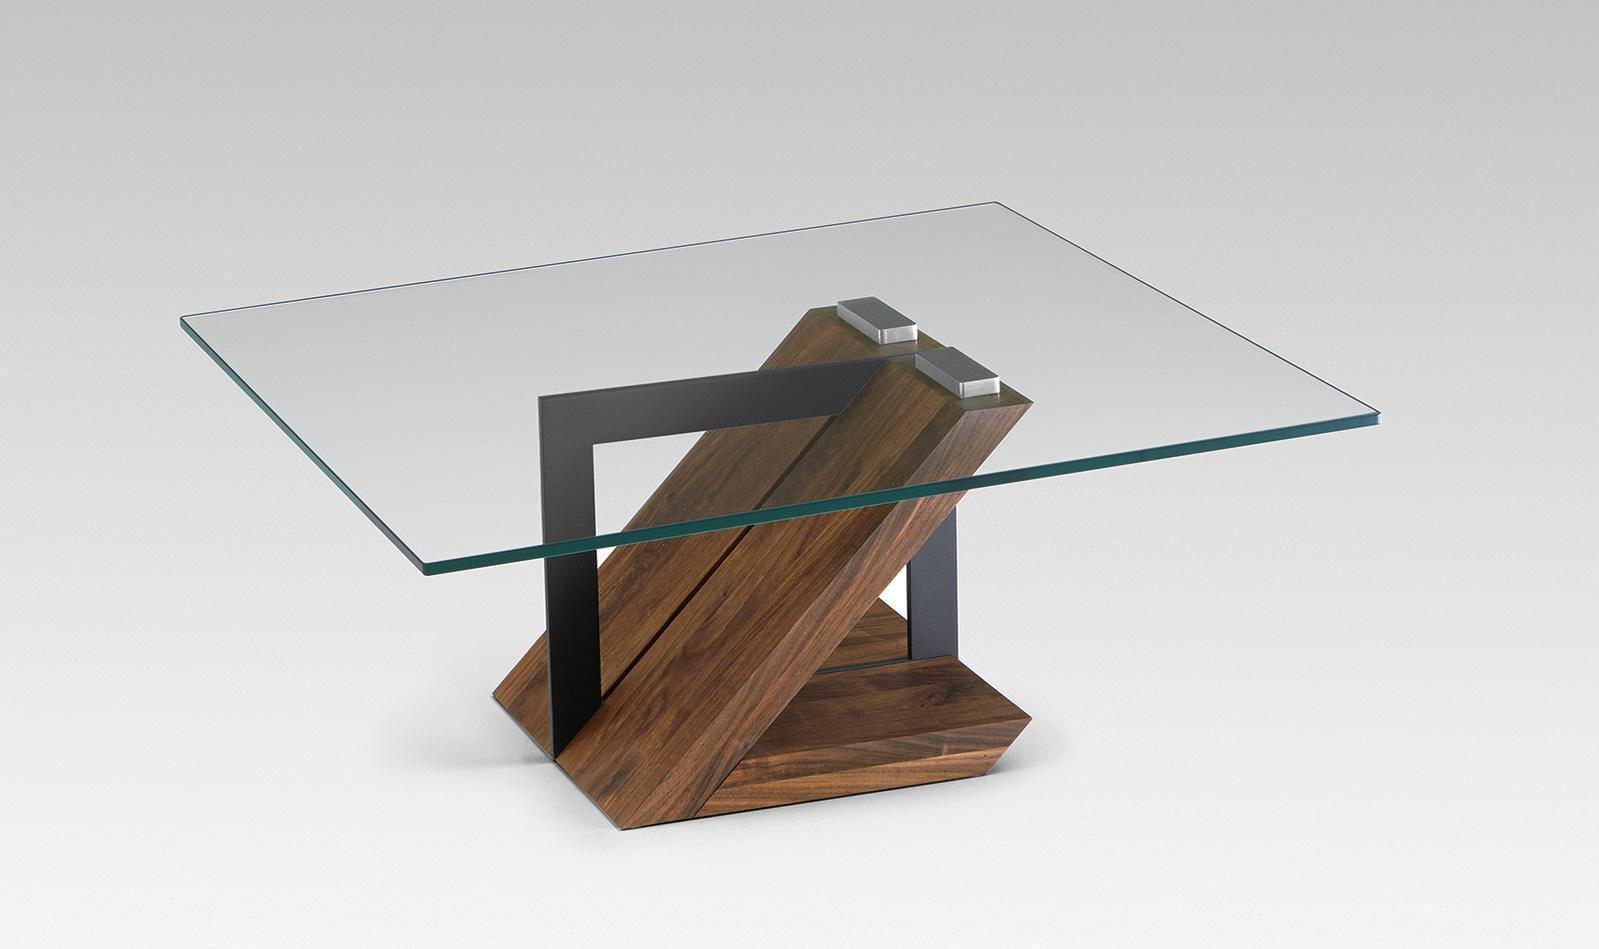 Couchtisch glas holz  Moderner Couchtisch / Holz / Glas / rechteckig - 4104 - Alfons ...